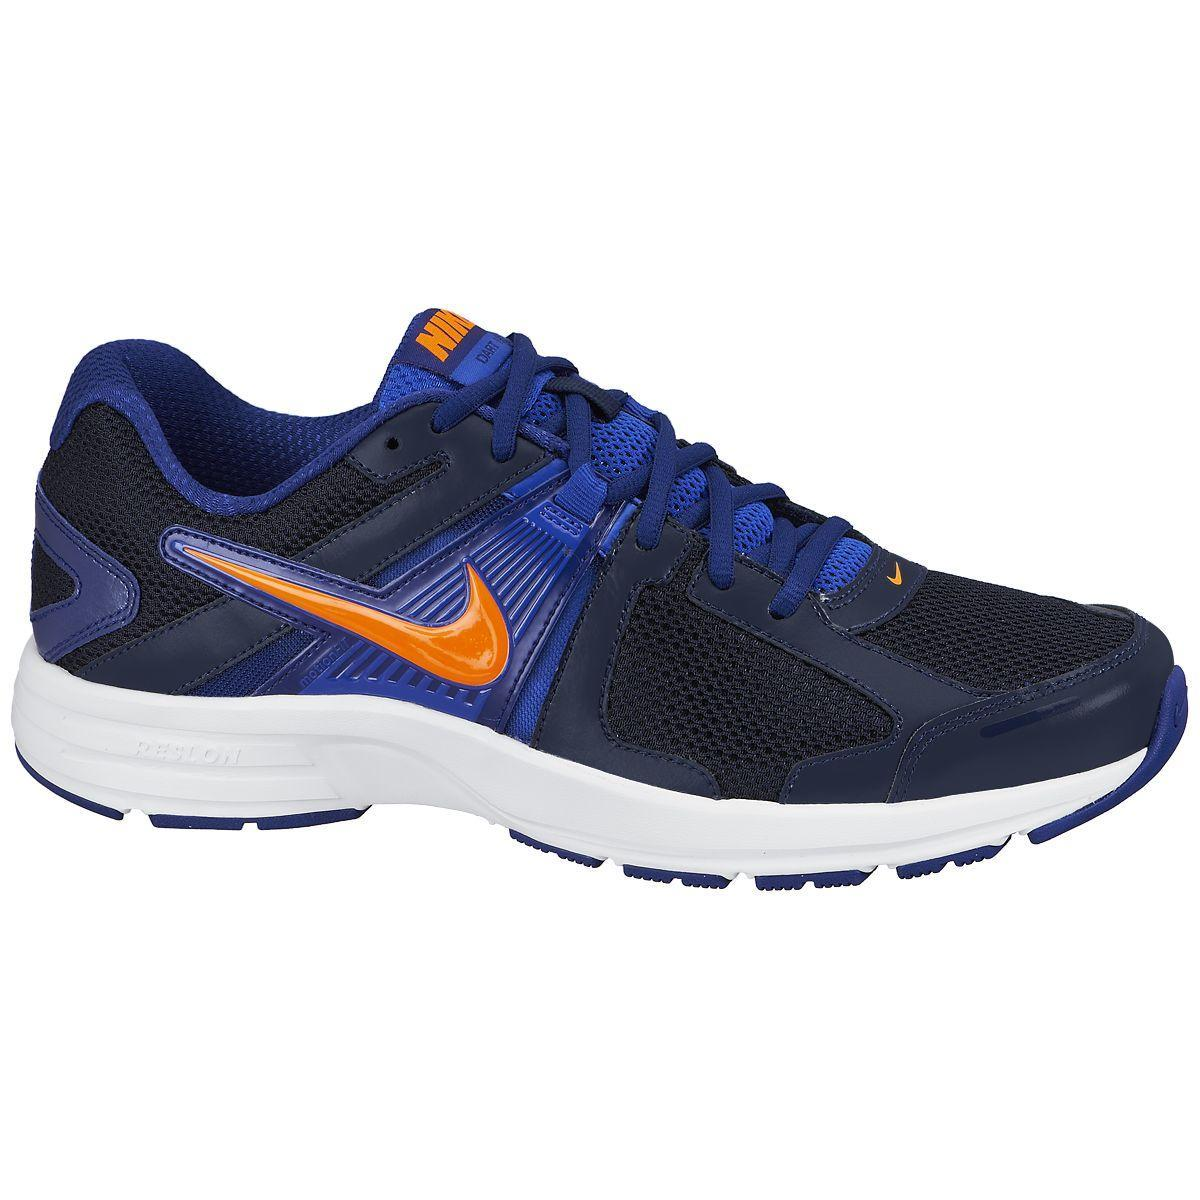 ca42ff3ab2ae4 Nike Mens Dart 10 Running Shoes - Obsidian Deep Royal Blue - Tennisnuts.com